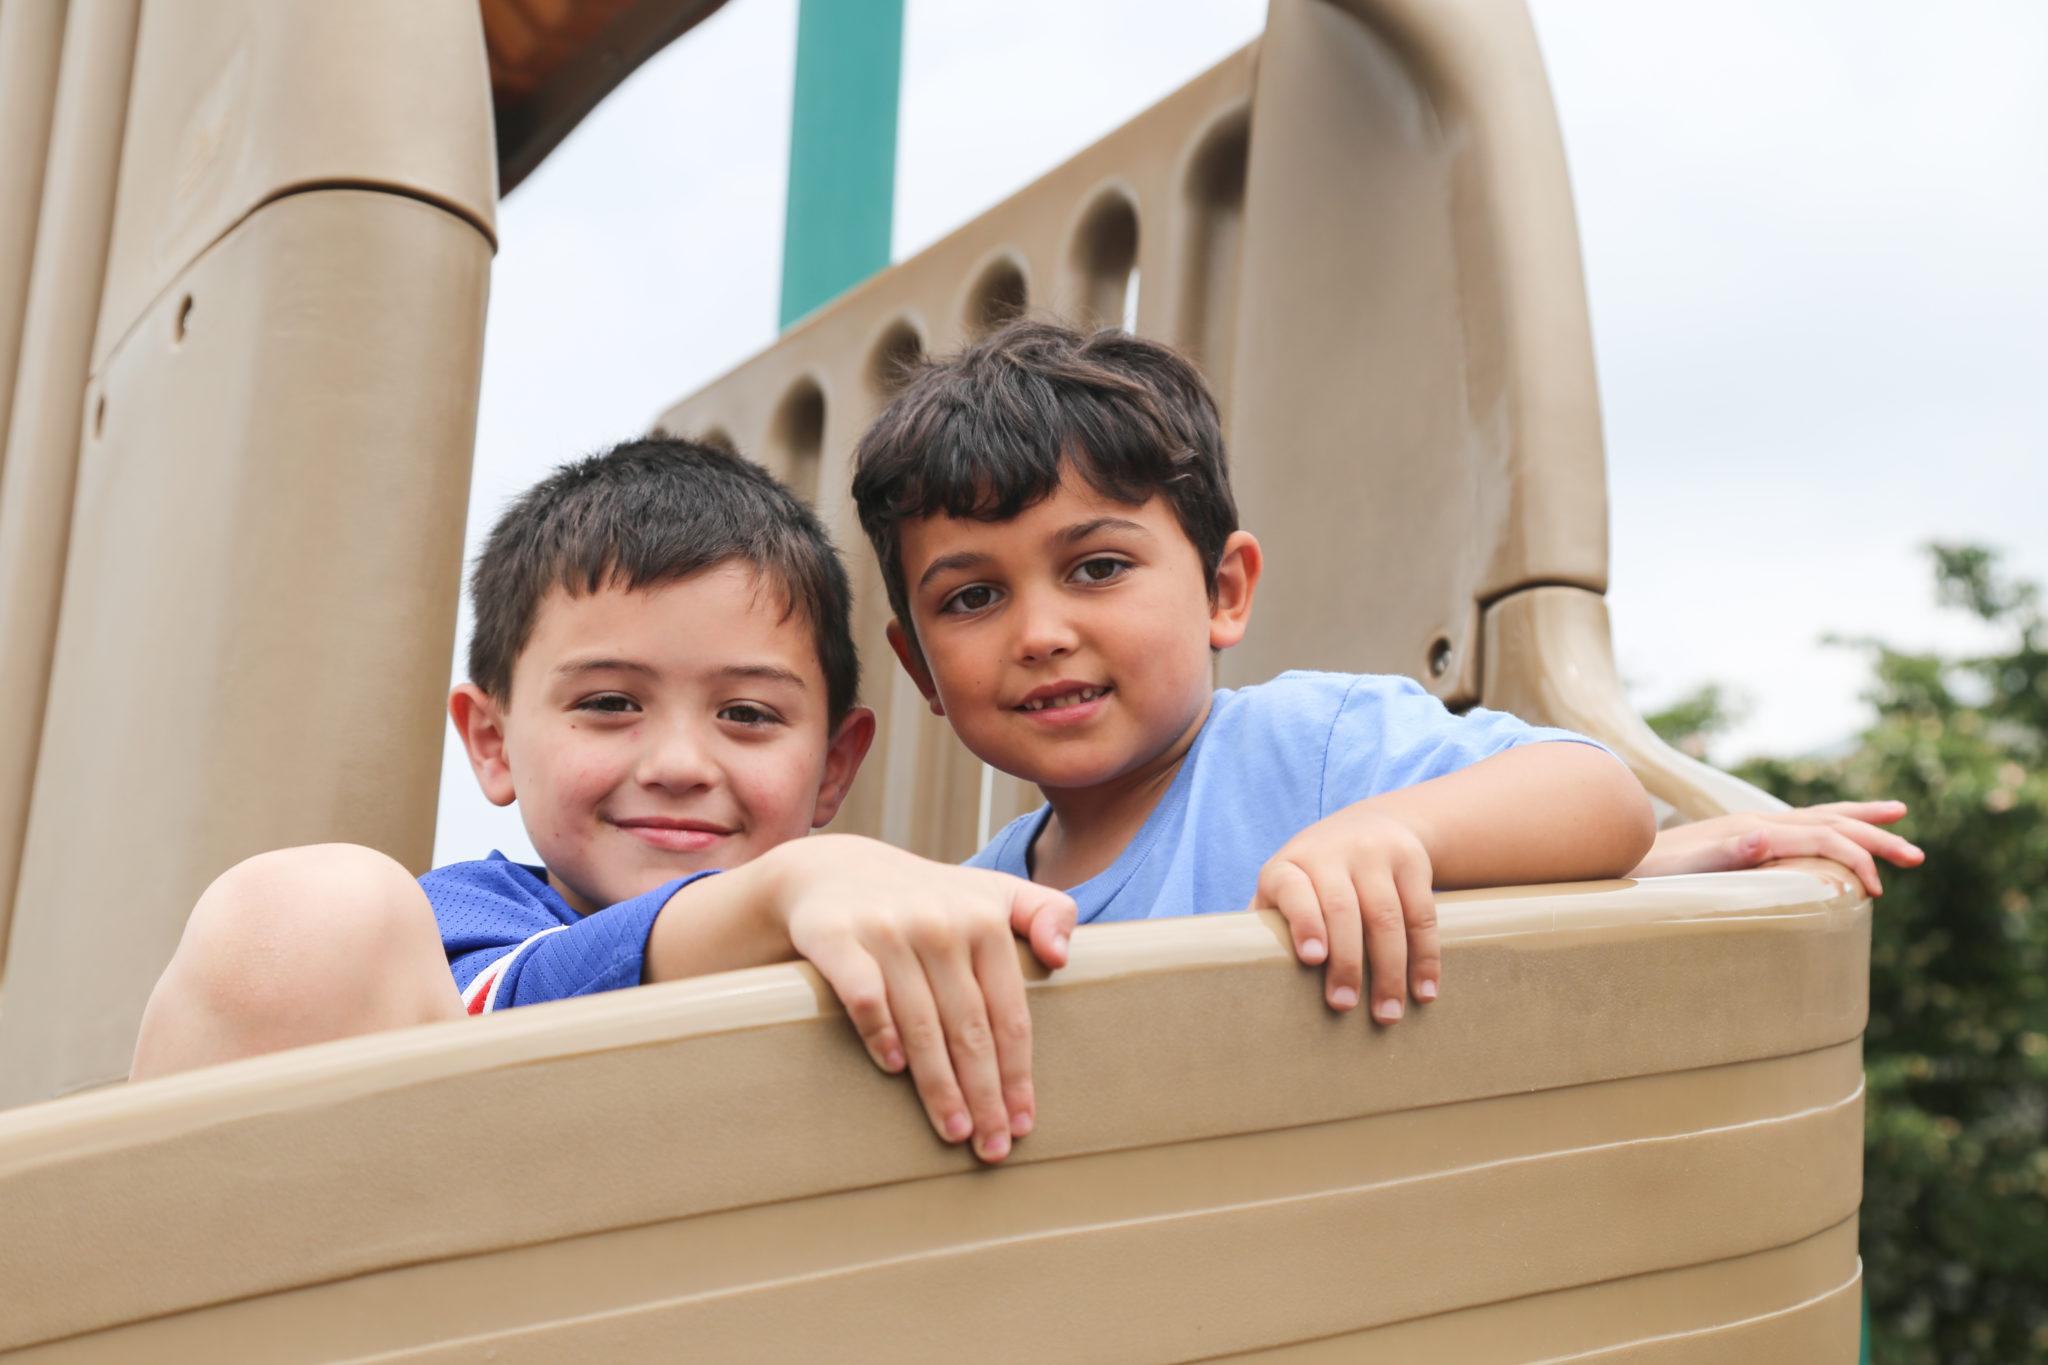 students sitting on slide smiling